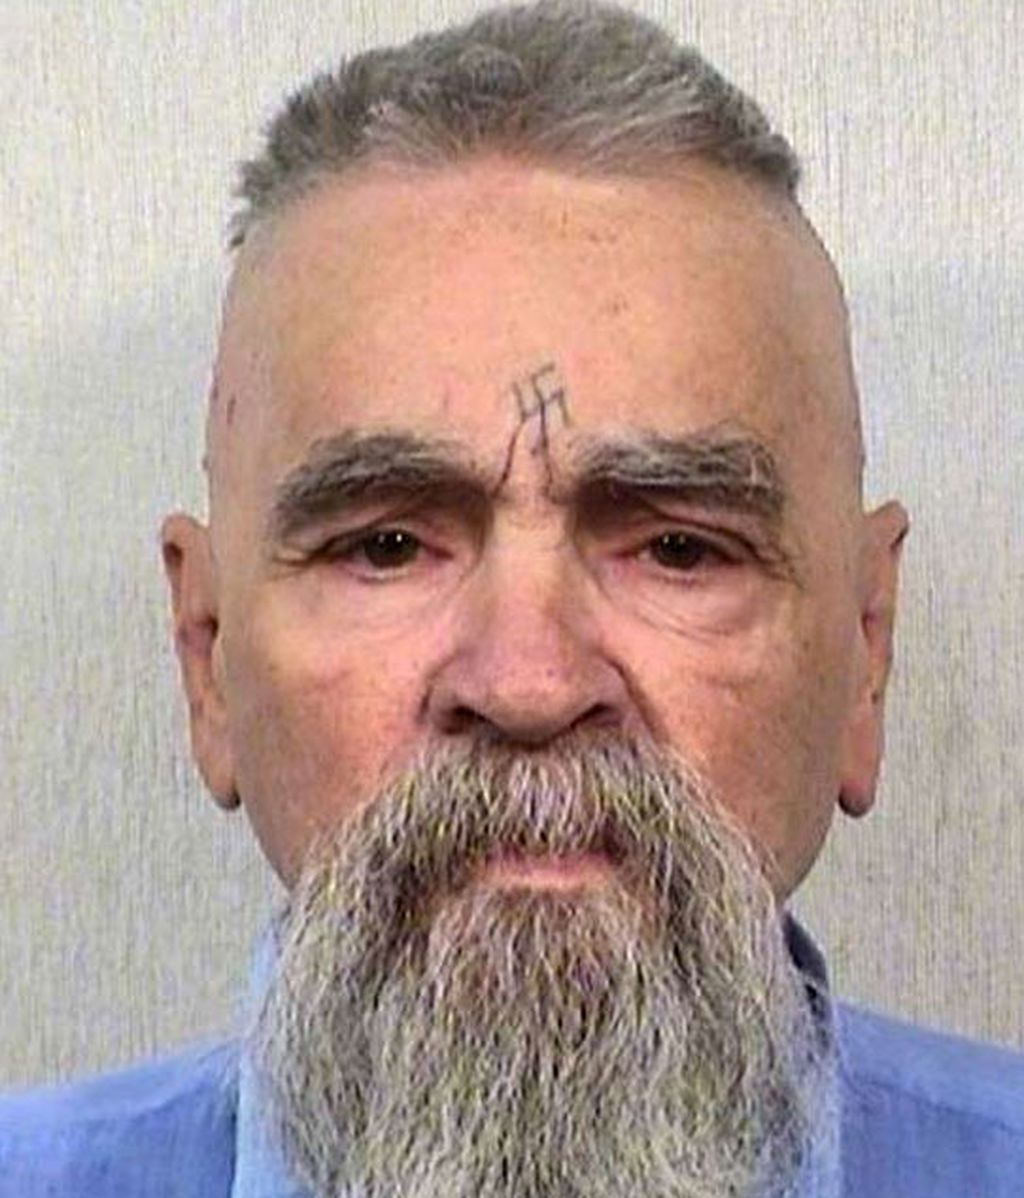 Hospitalizan al asesino Charles Manson en California